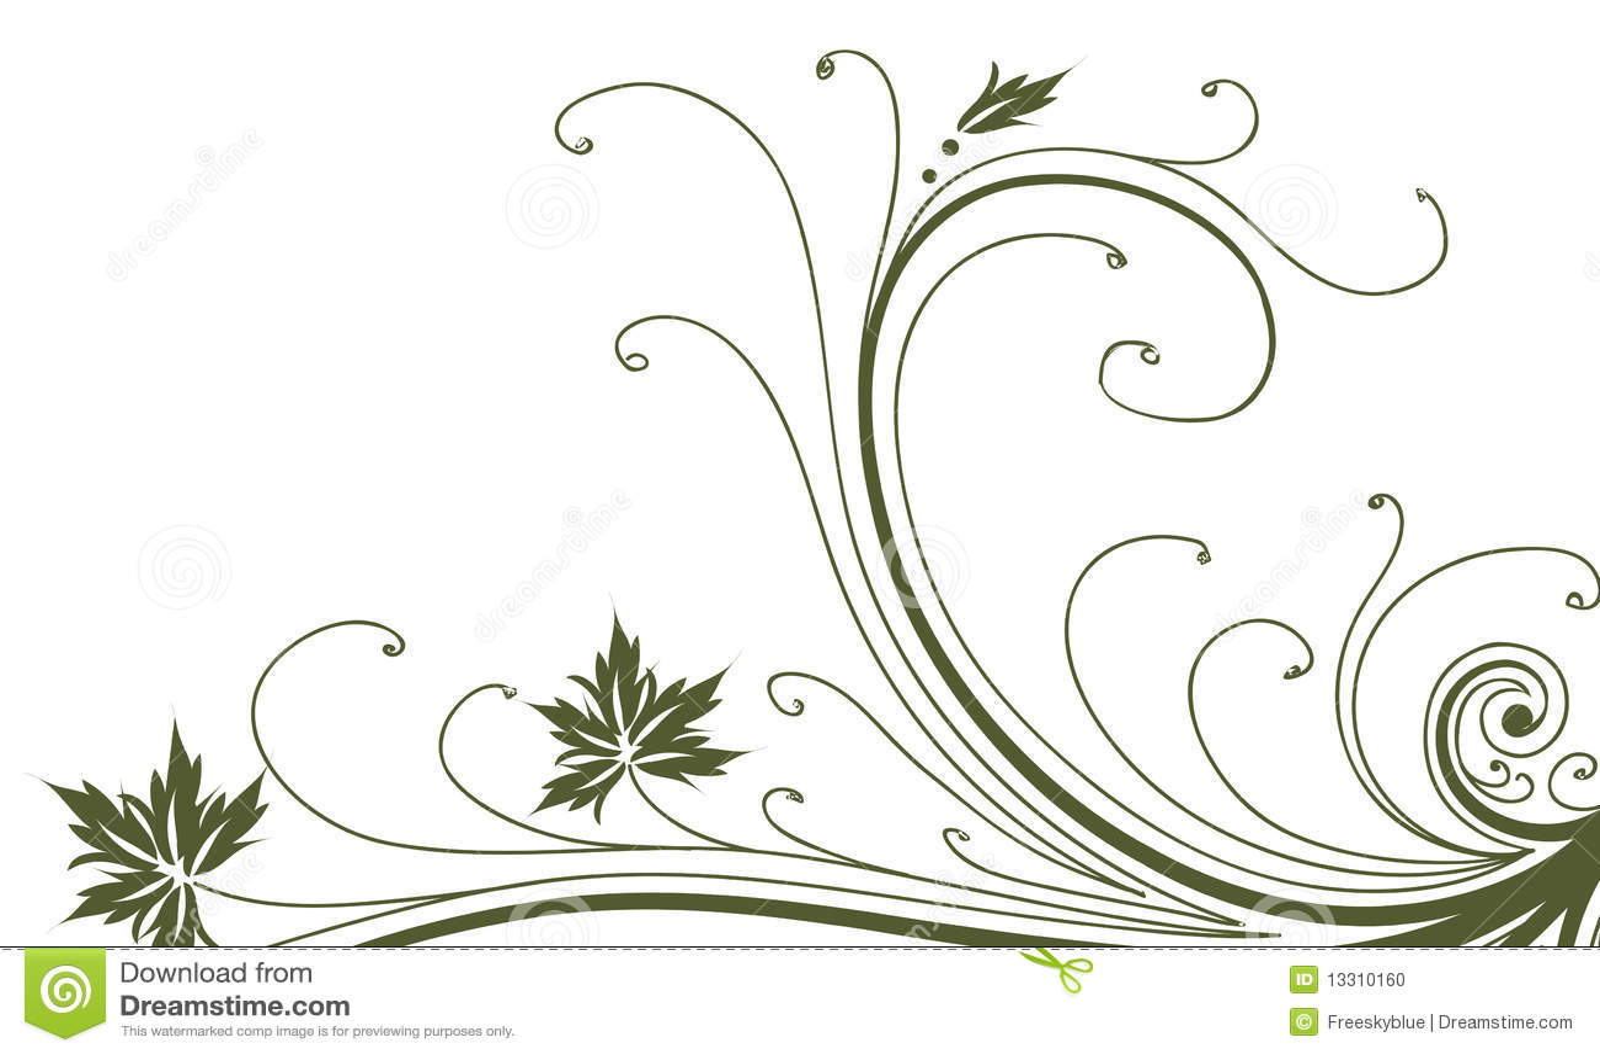 7c731df80 Vines and leaves pattern stock illustration. Illustration of artwork ...